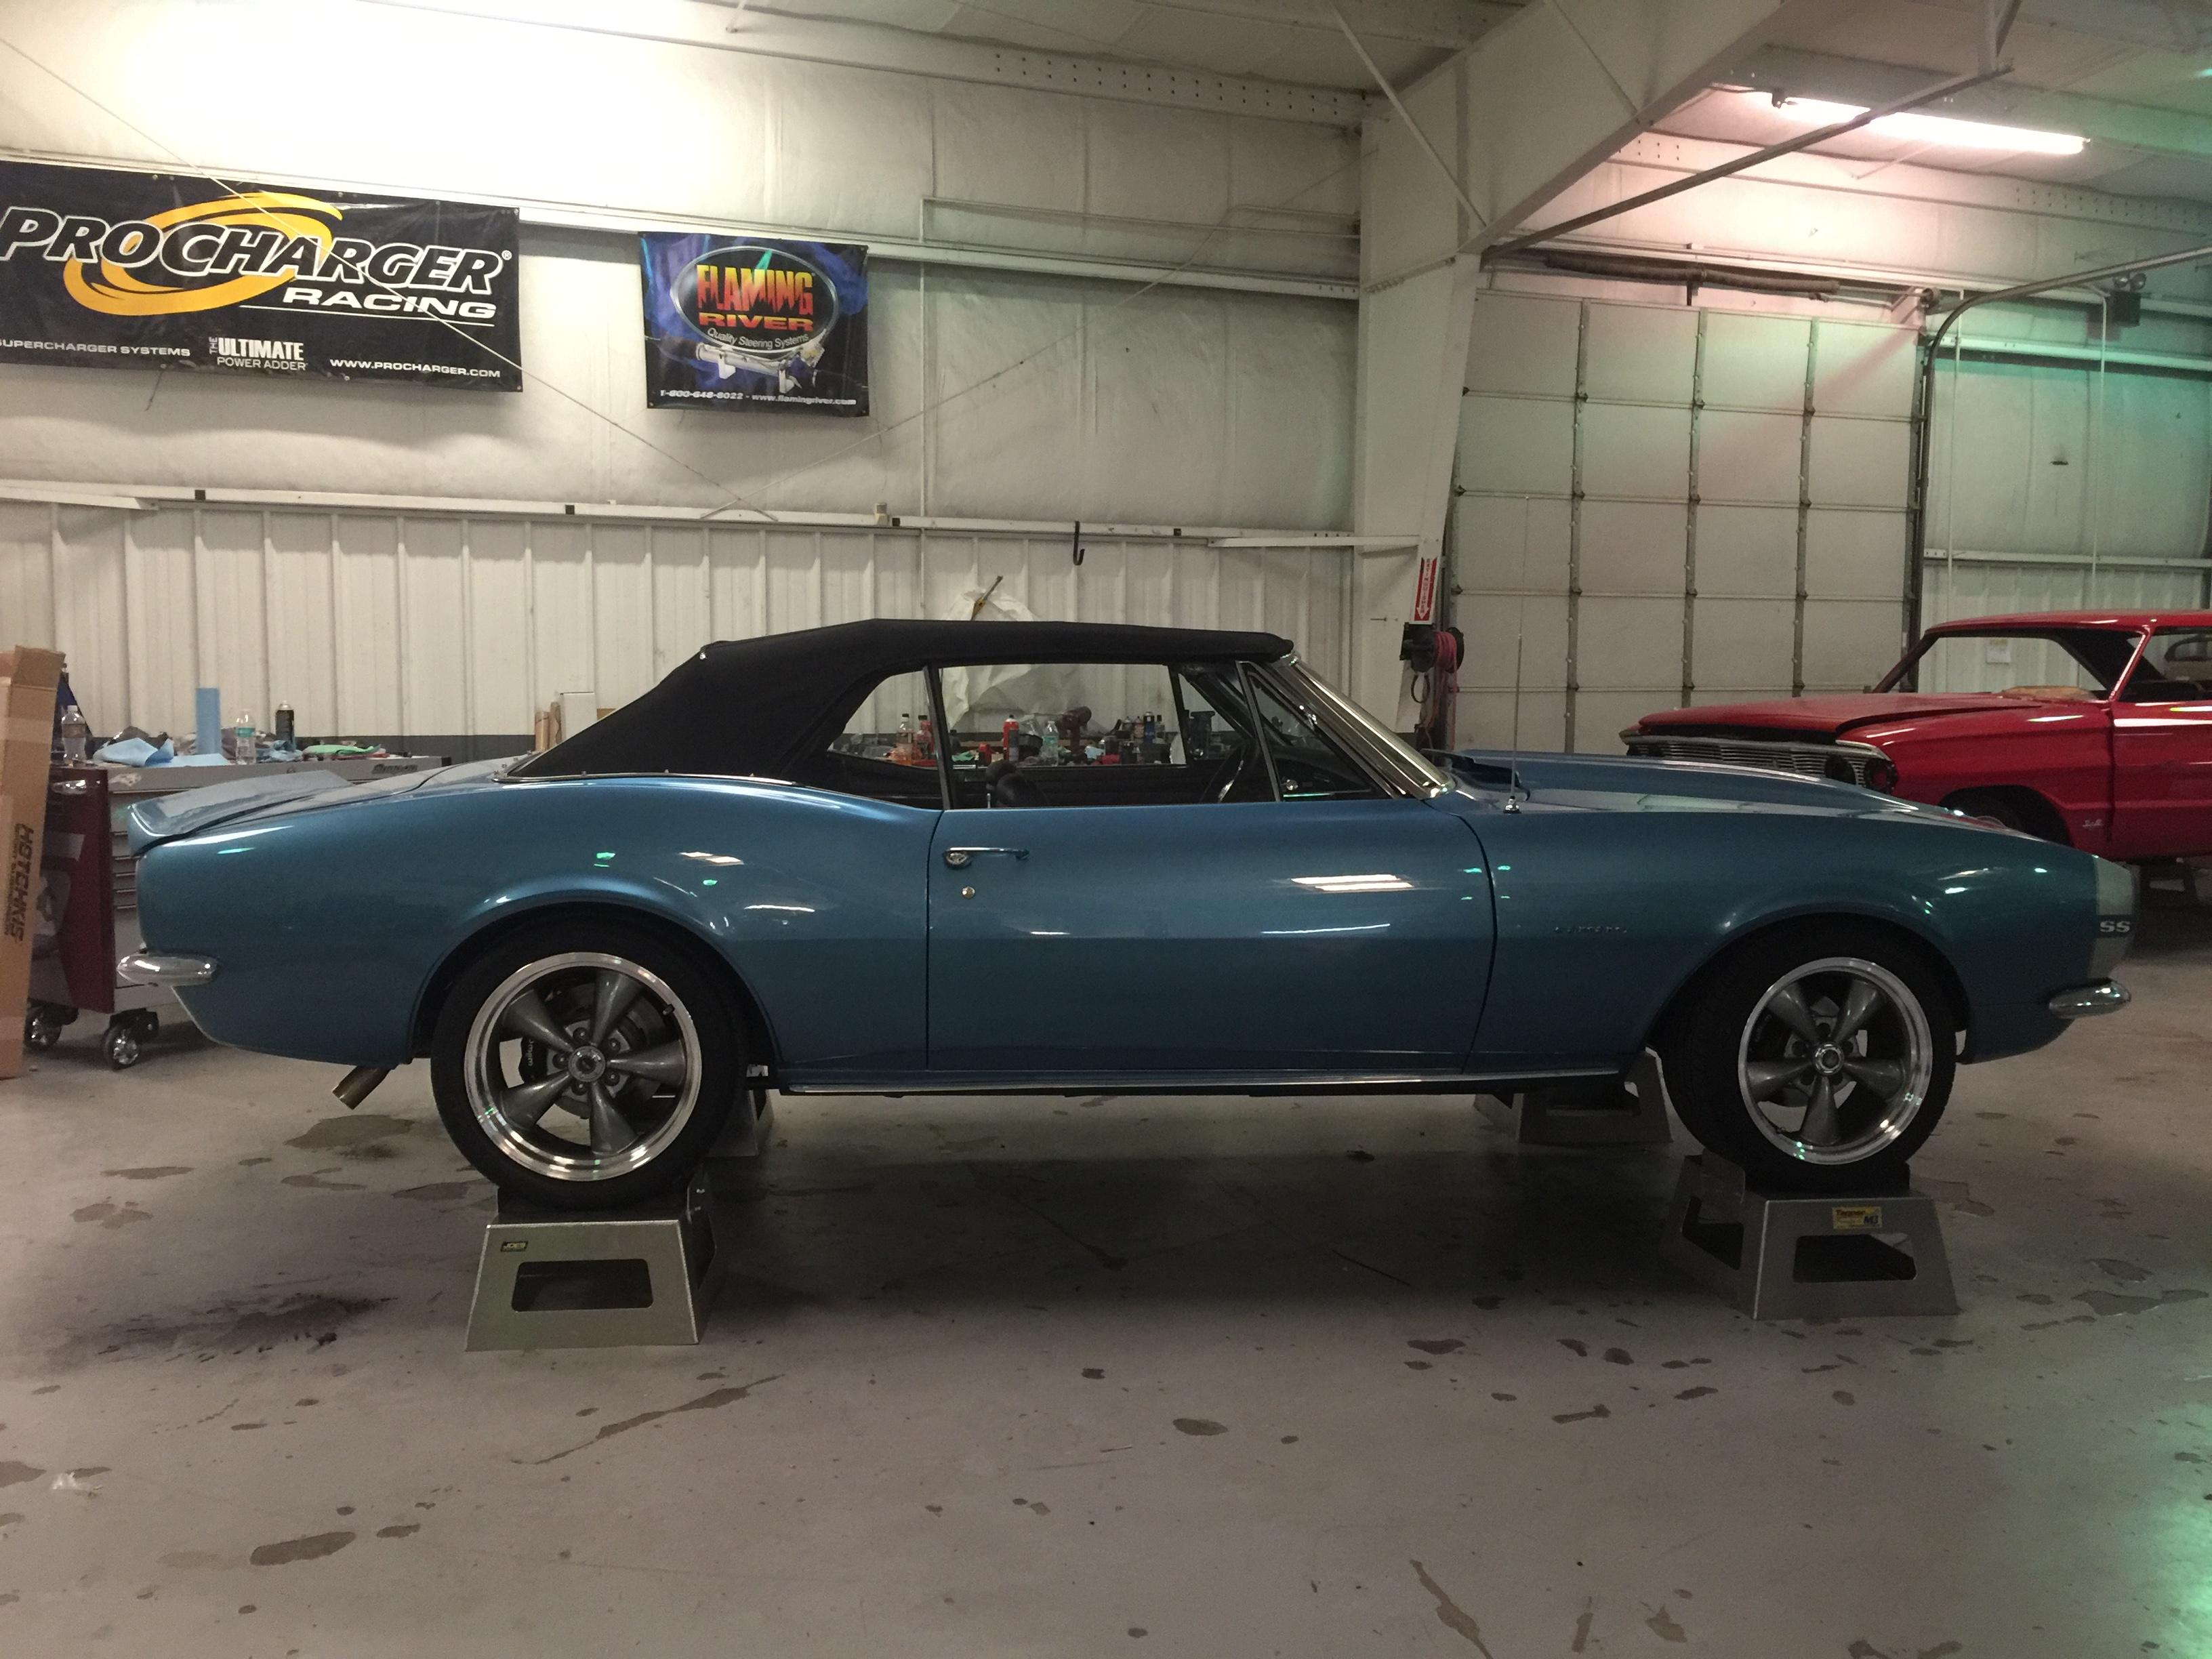 1967 Camaro project